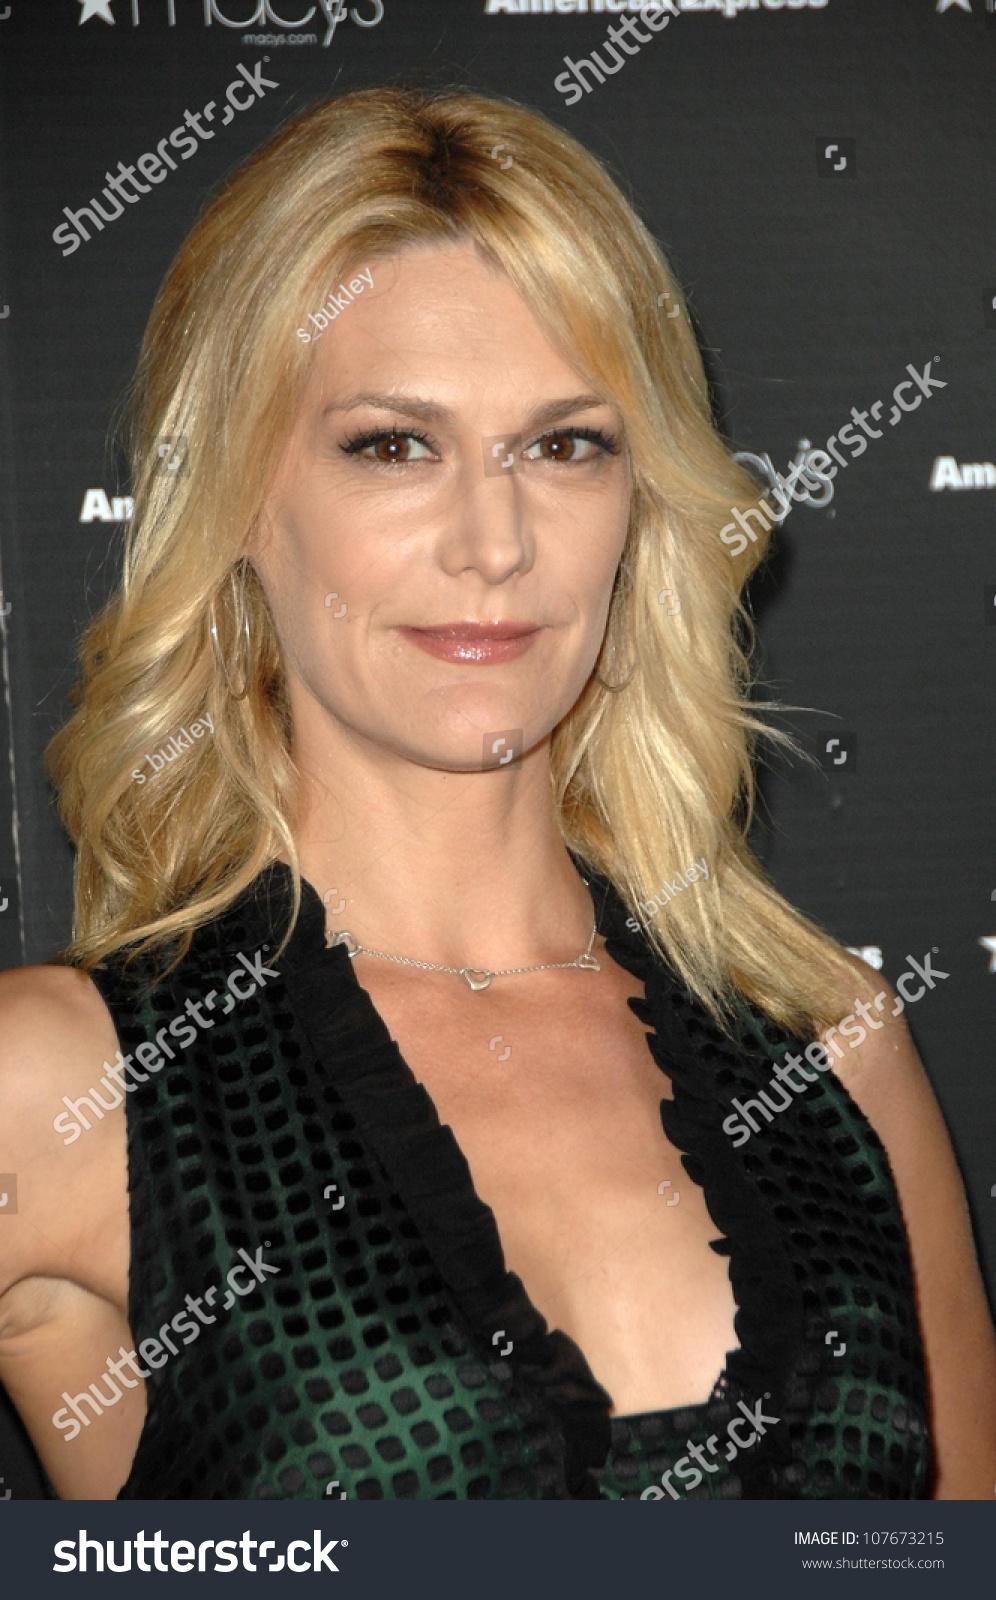 Jenn Colella nudes (17 photos), Sexy, Bikini, Twitter, braless 2006